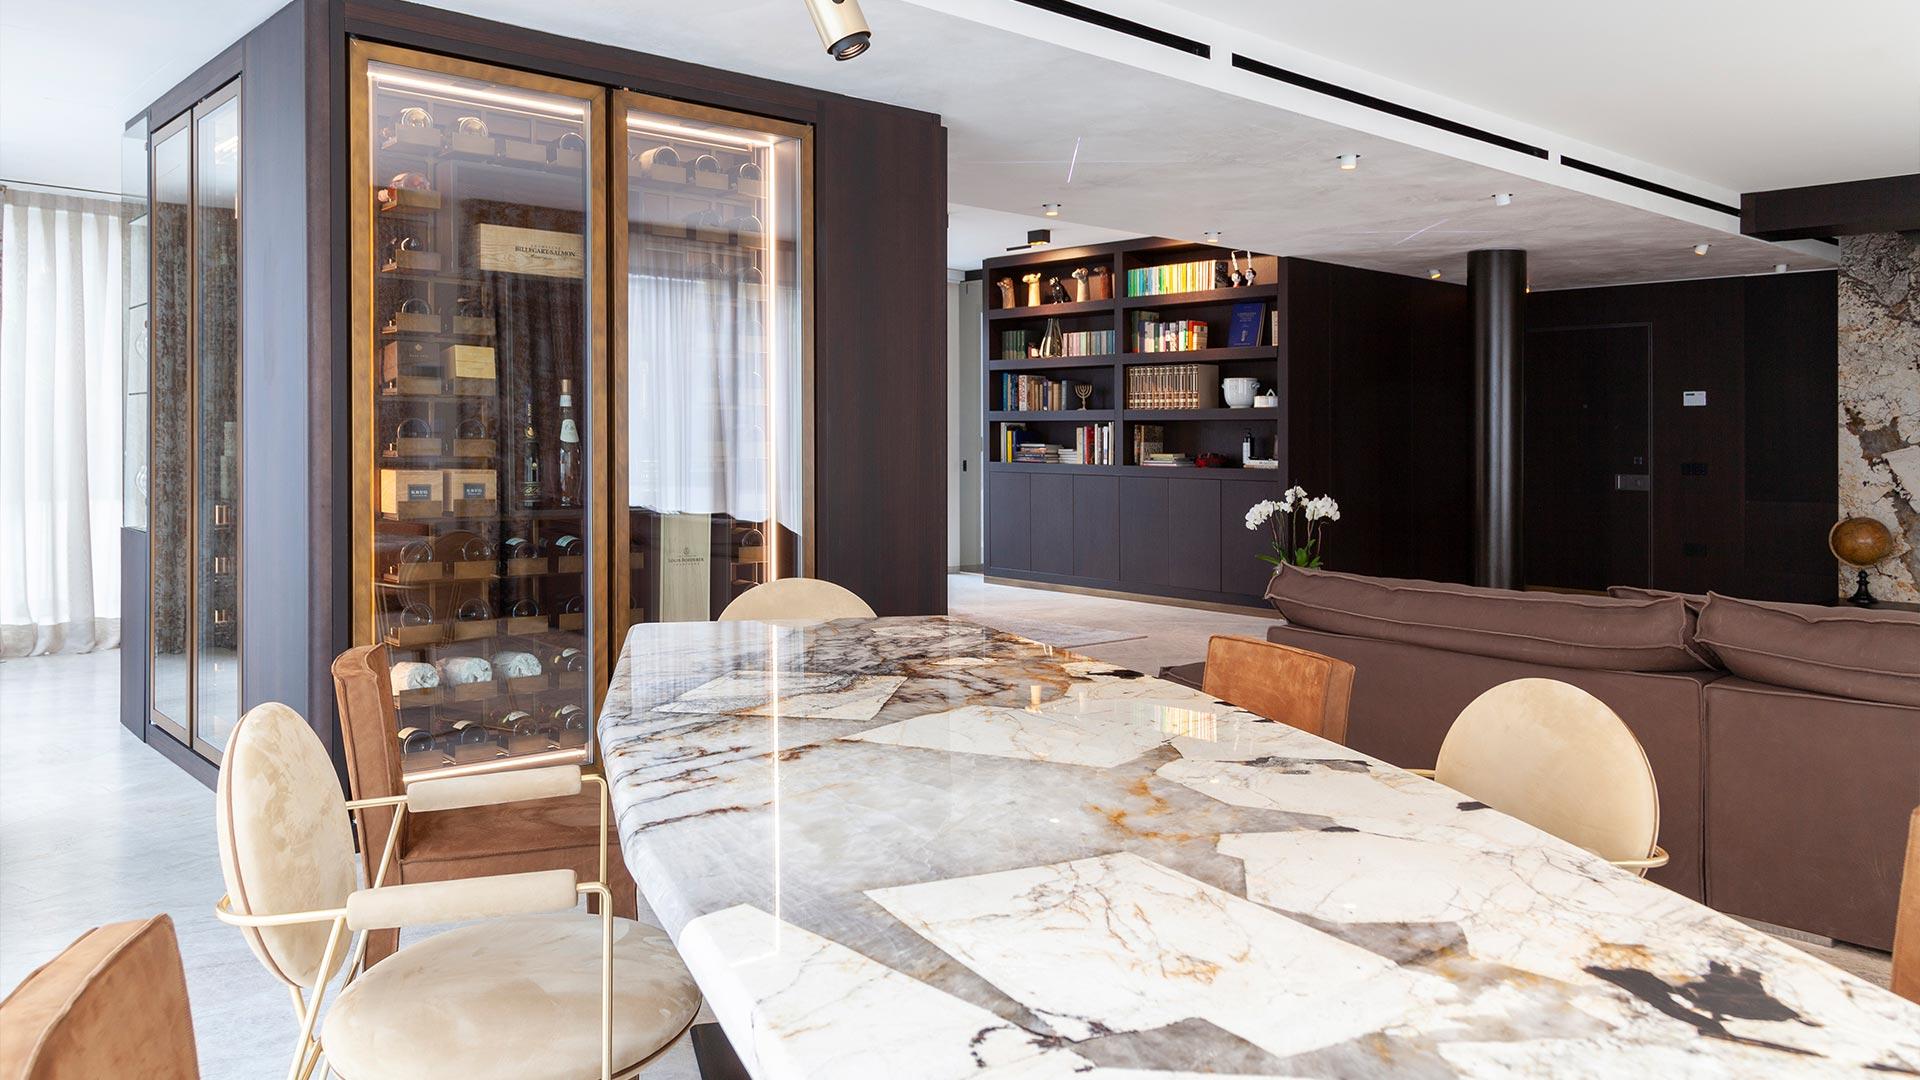 TM Italia   INTERIOR: turnkey bespoke interiors in Treviso